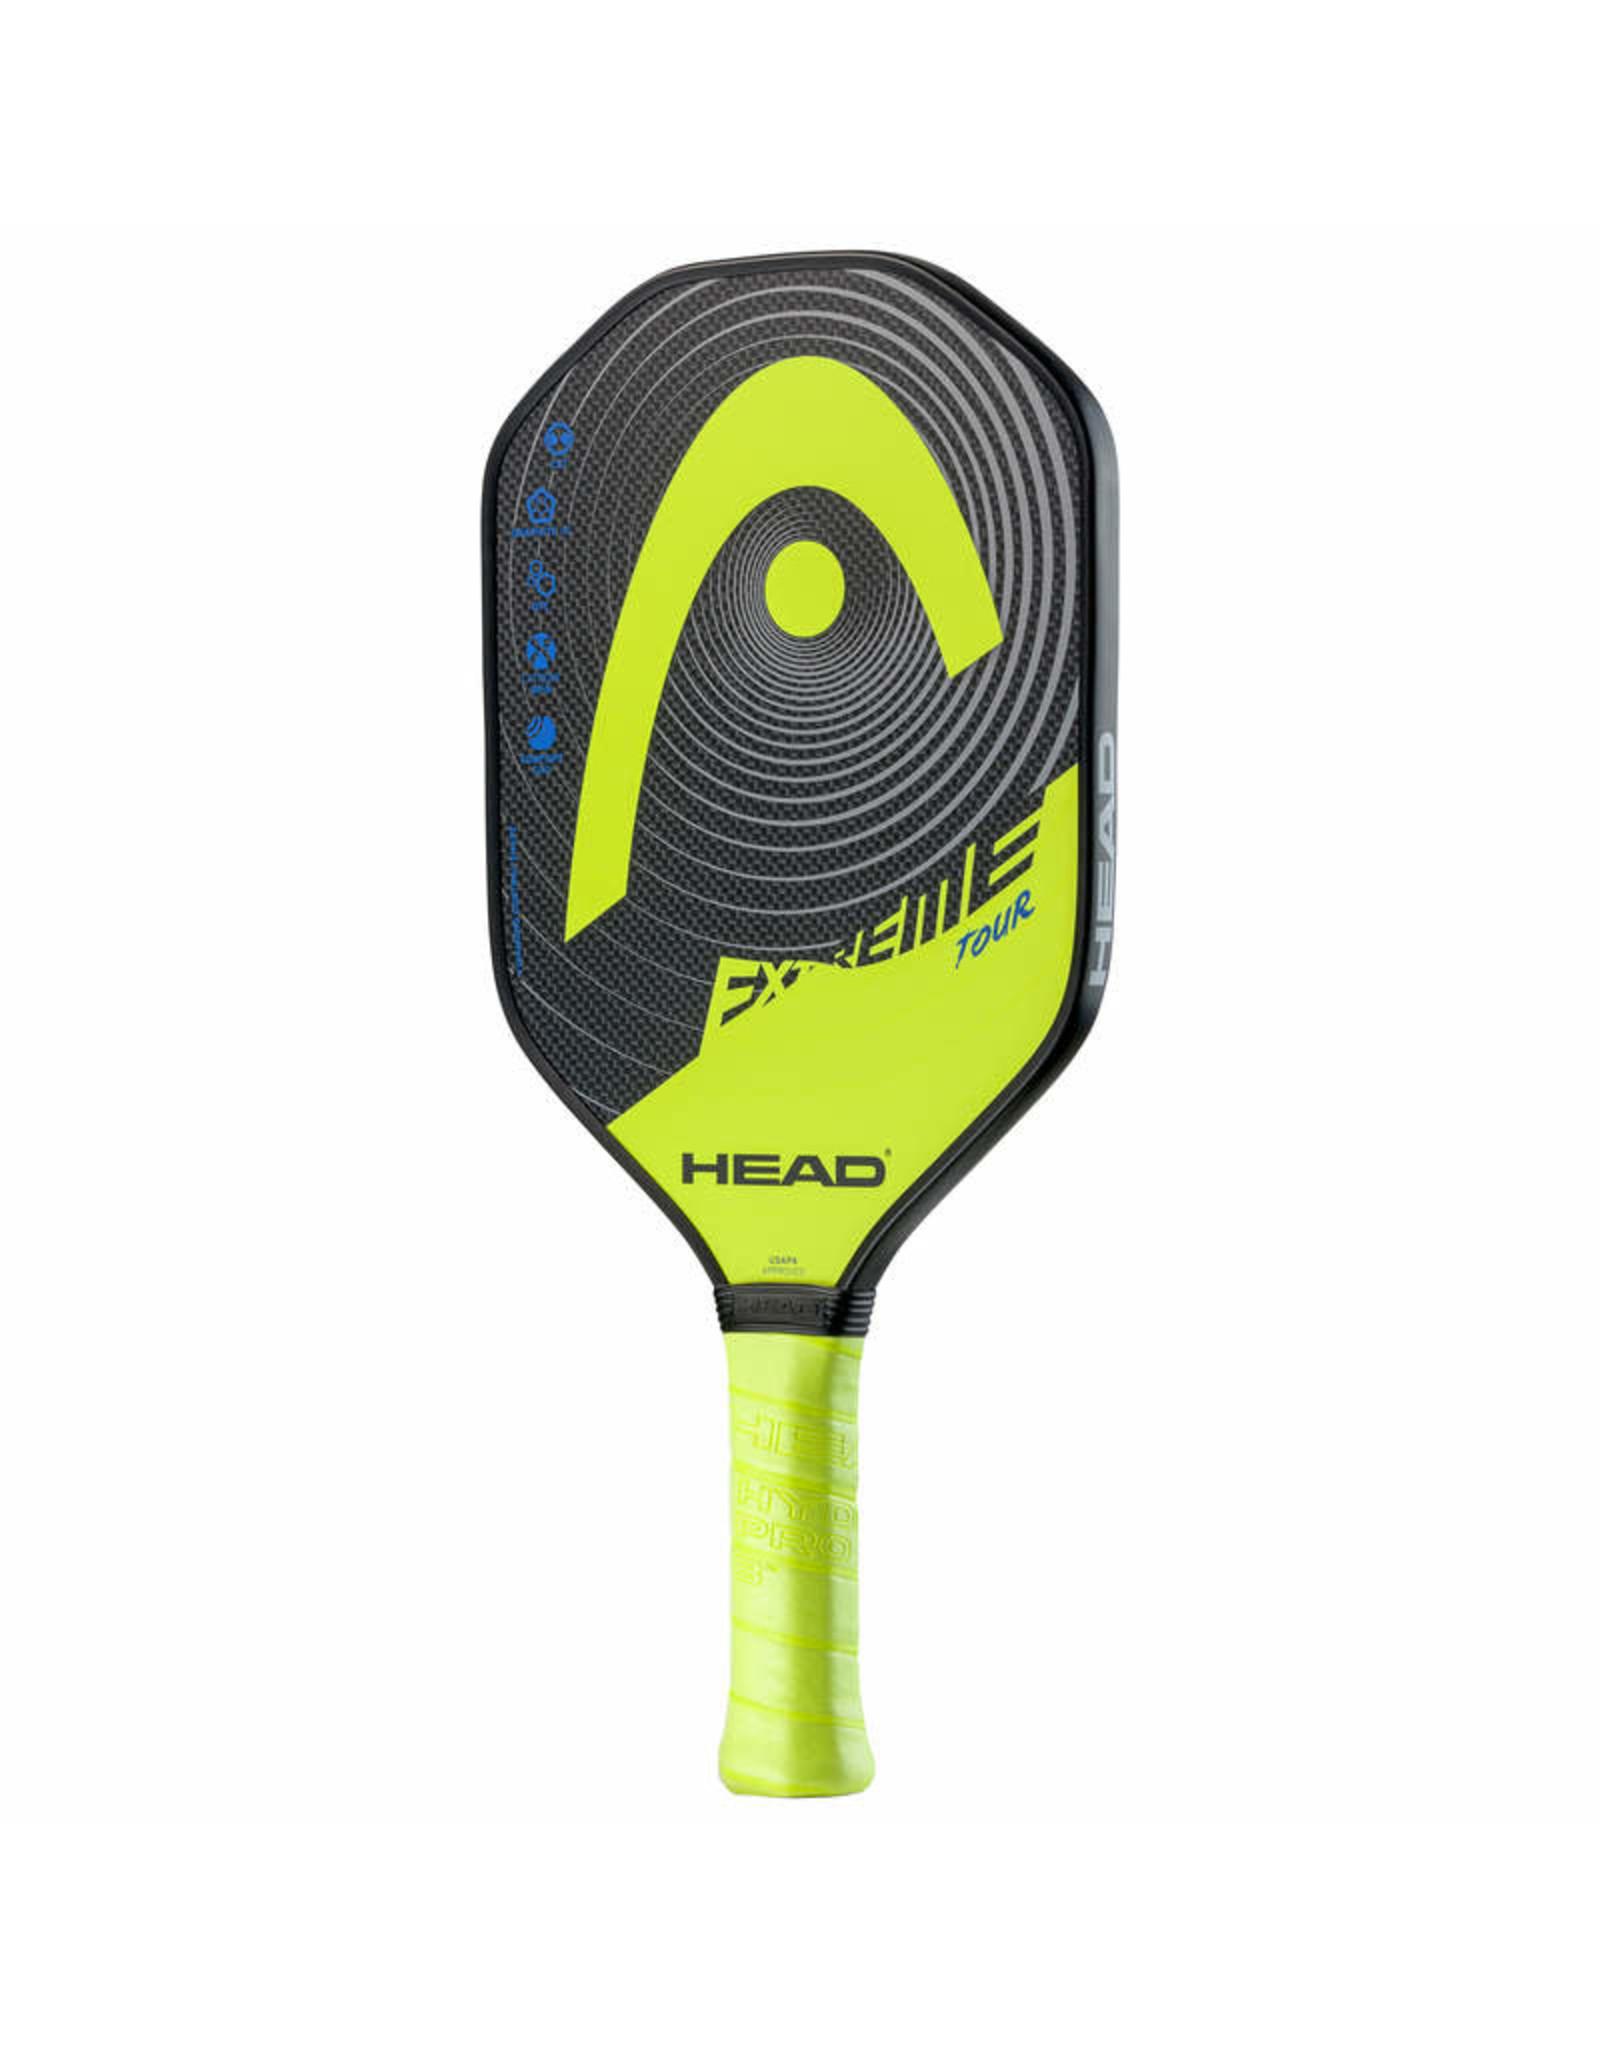 Head Head Extreme Tour (2021) Pickleball Paddle